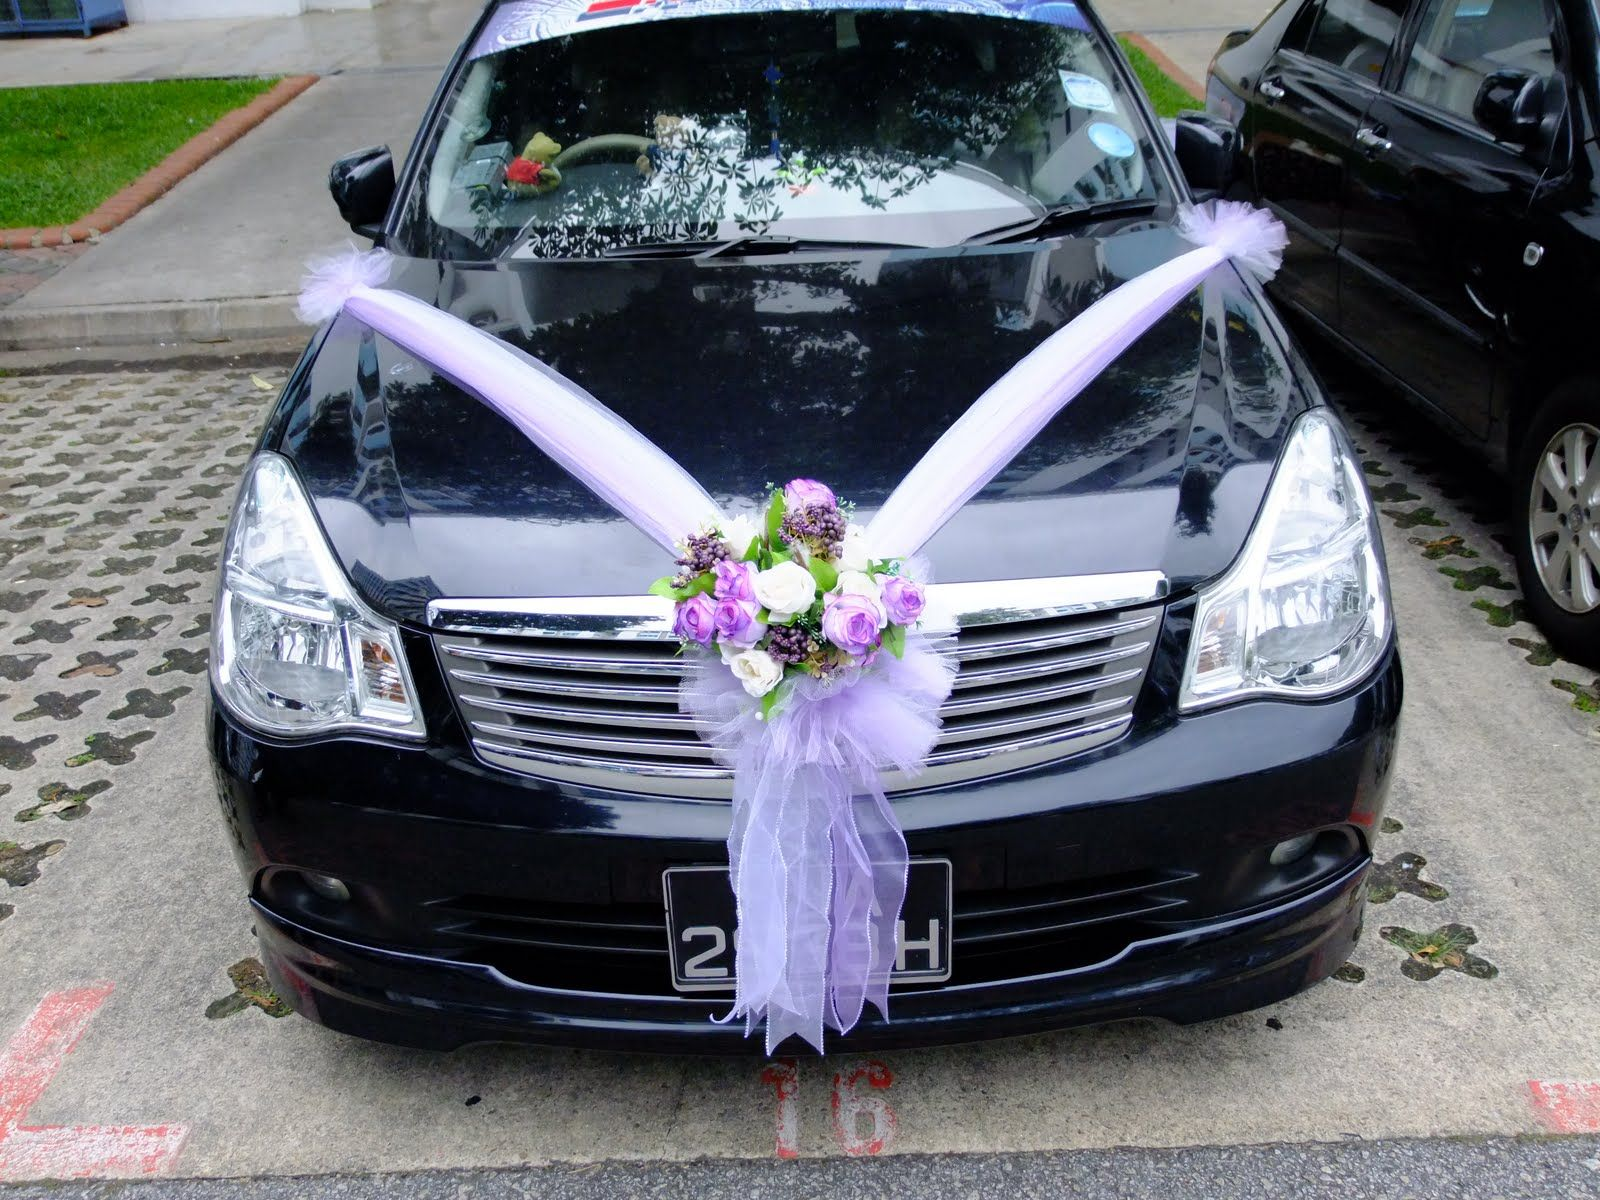 Wedding vehicle decorations  Wedding Car Decoration for Rental  Weddings  Pinterest  Wedding